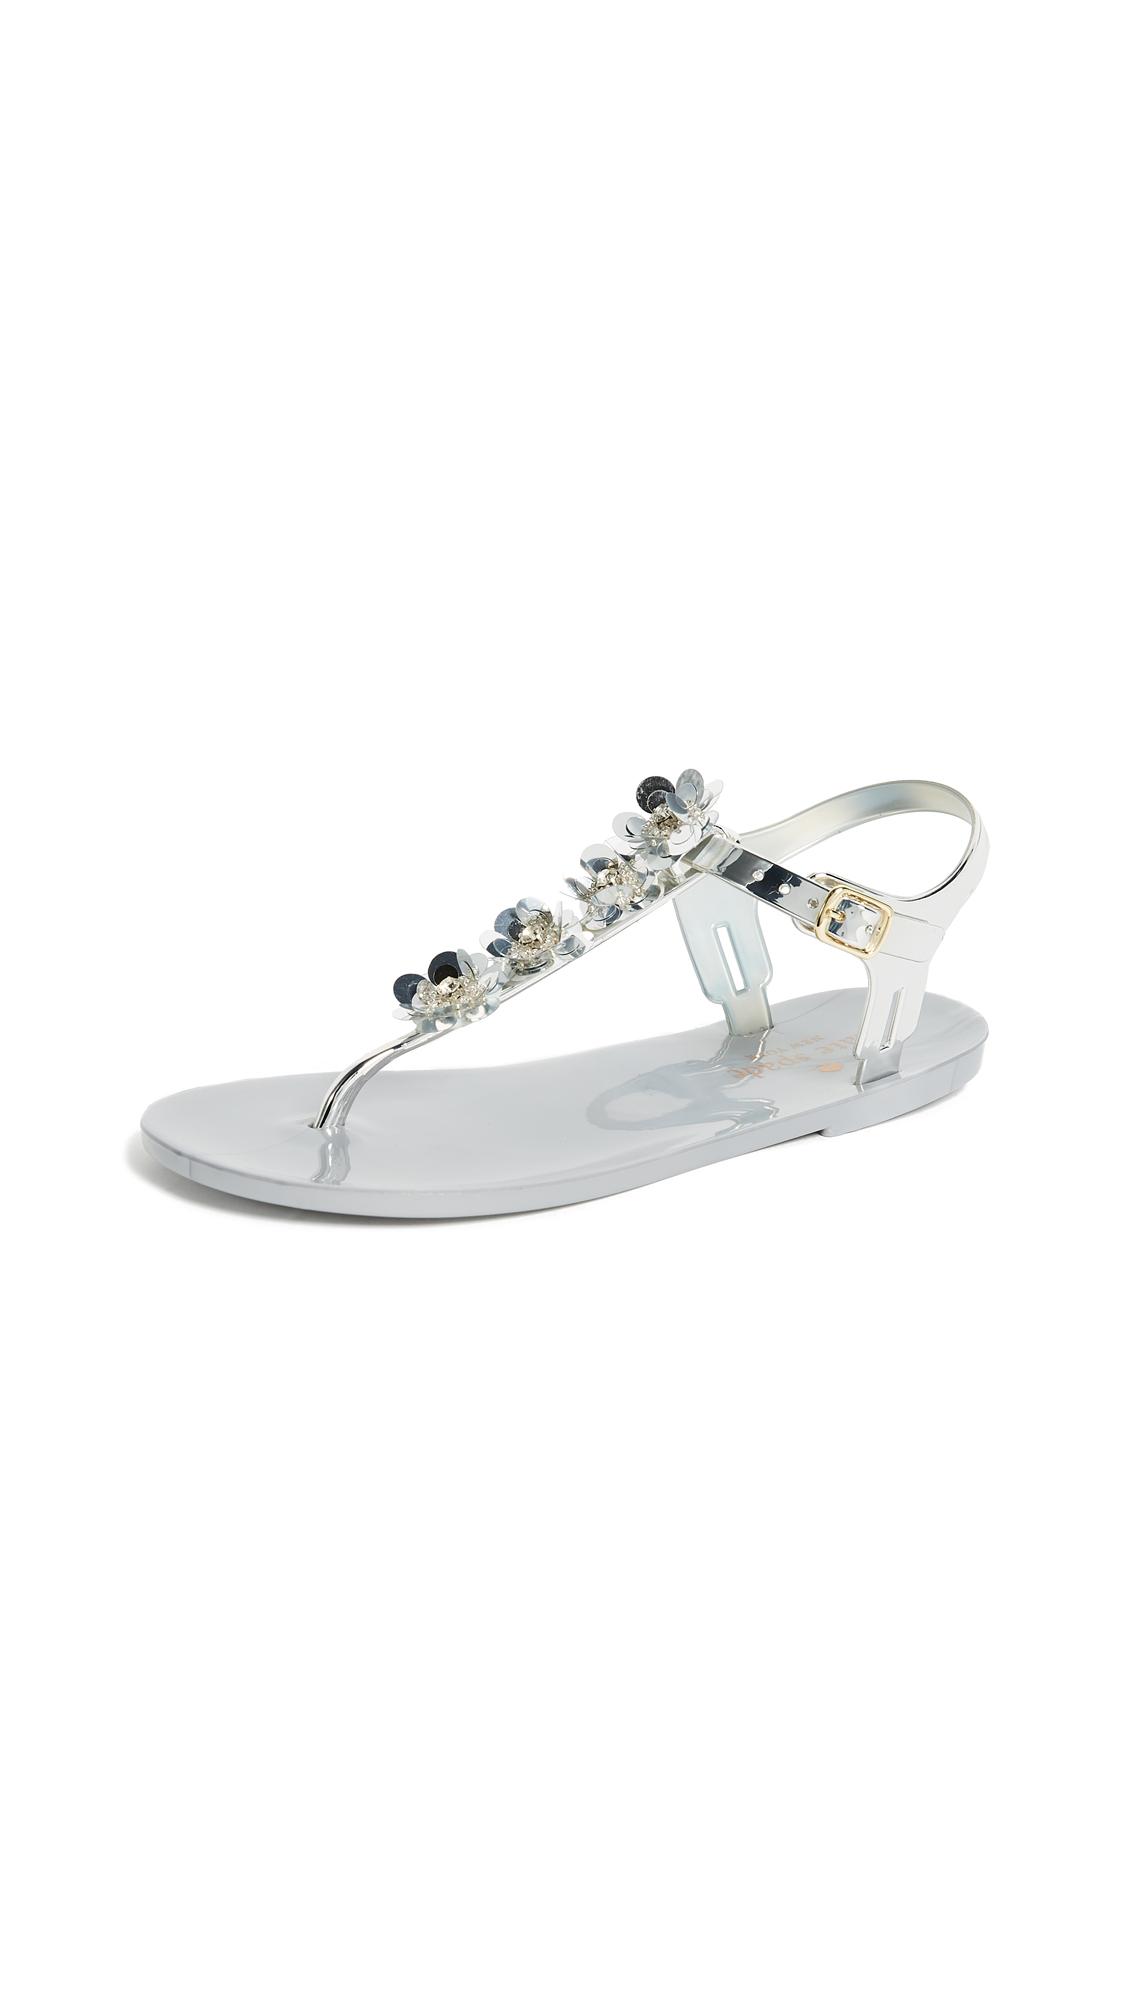 Kate Spade New York Farrah Jelly Sandals